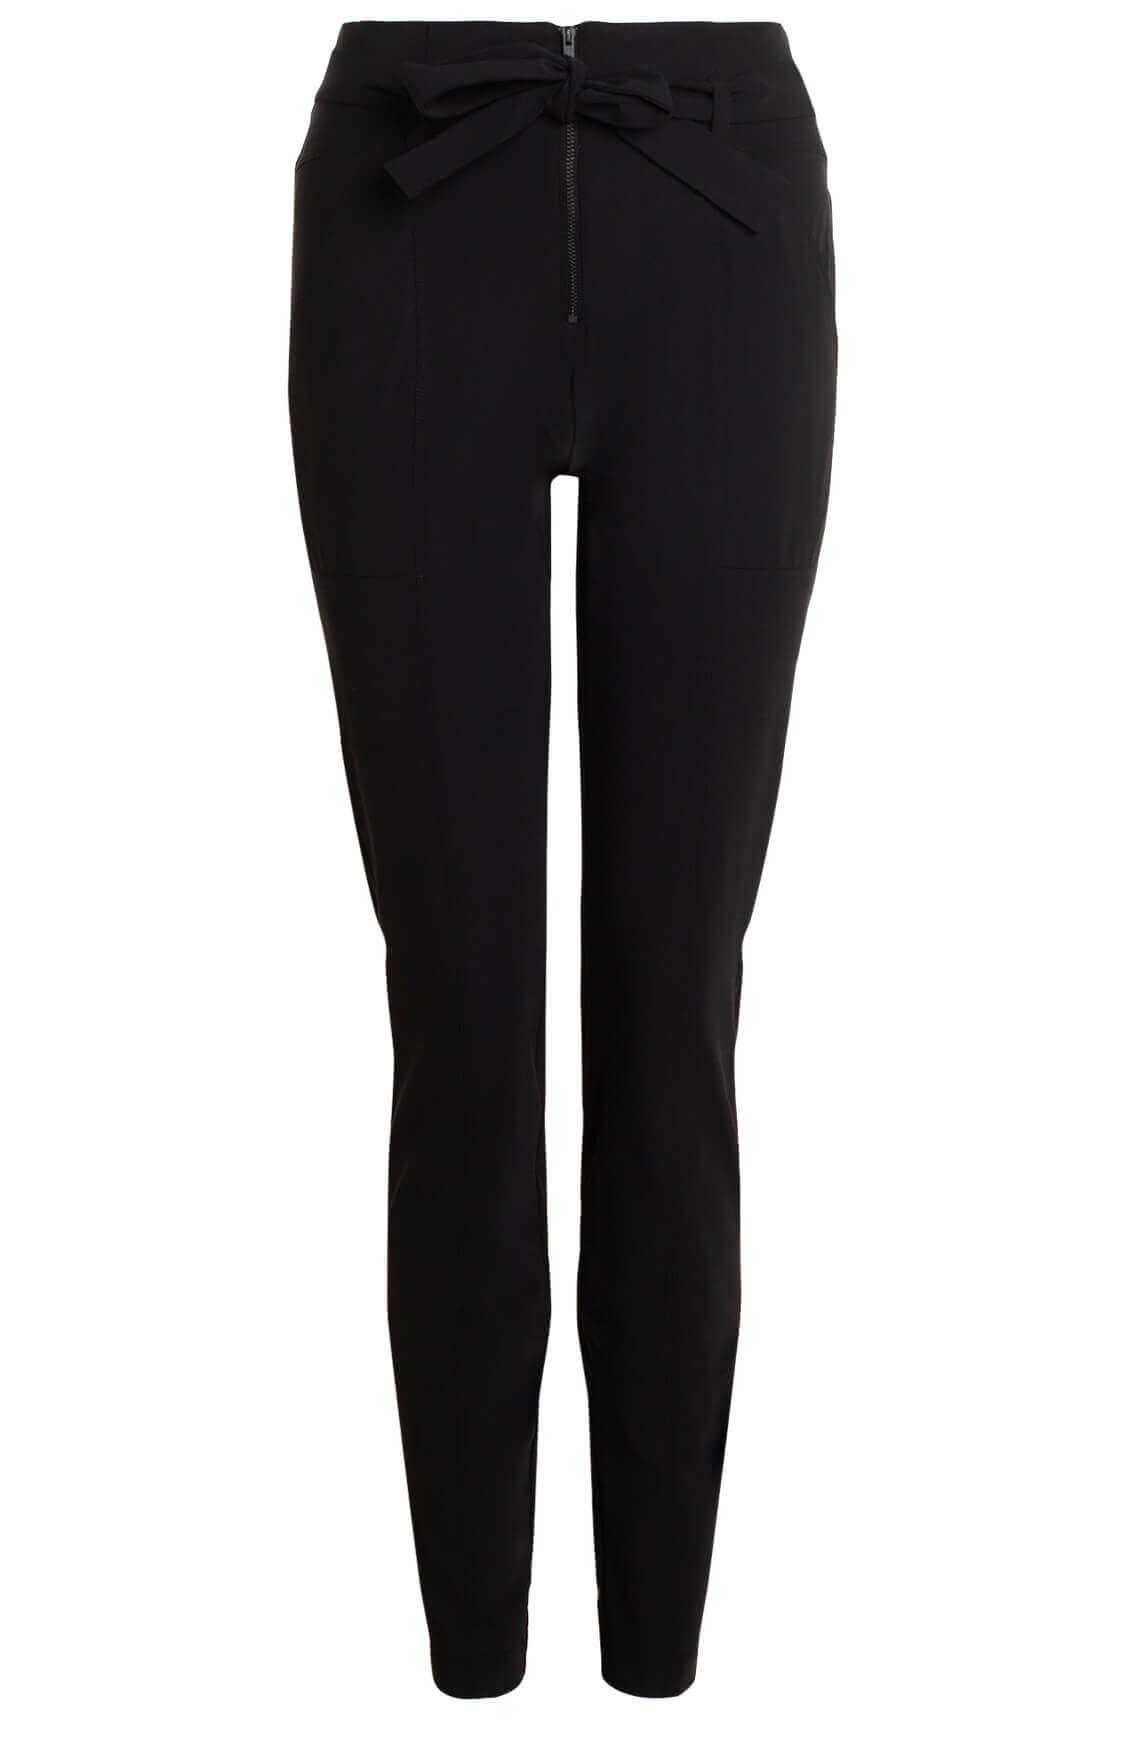 Anna Dames Jersey sensitive broek met rits zwart